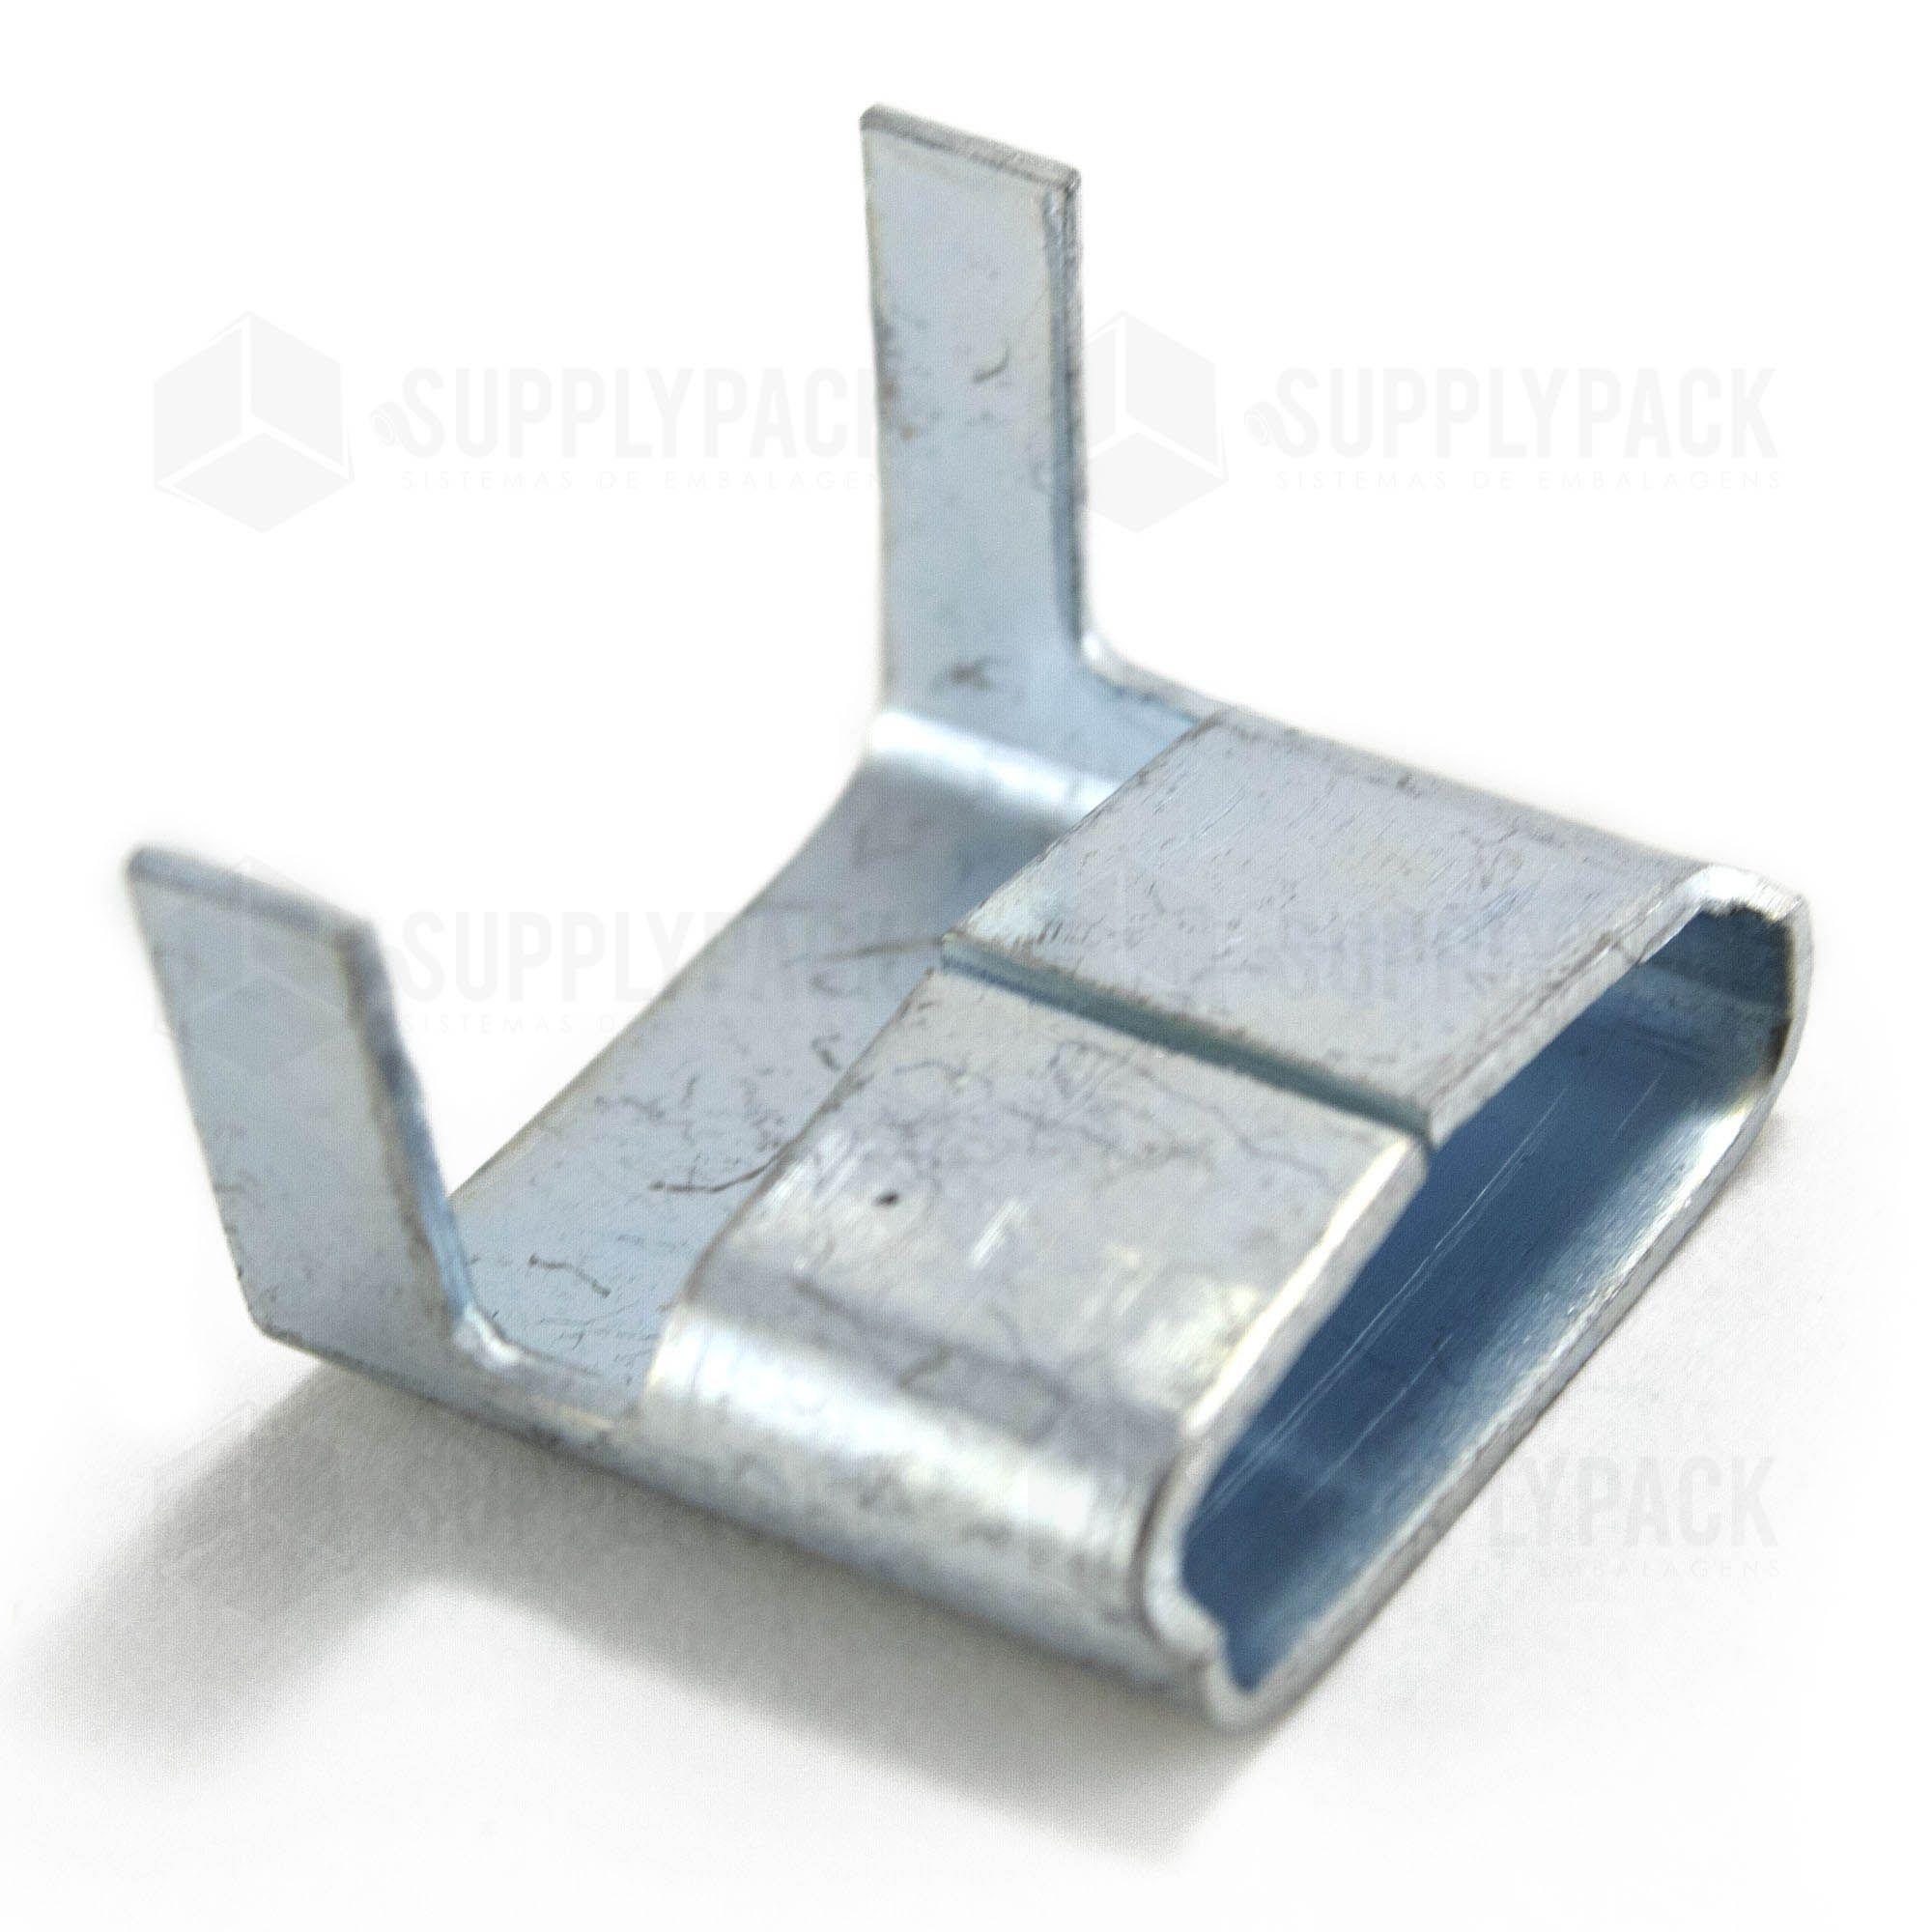 Selo Metalico VR p/ Fita de Aco 13mm KG Supplypack